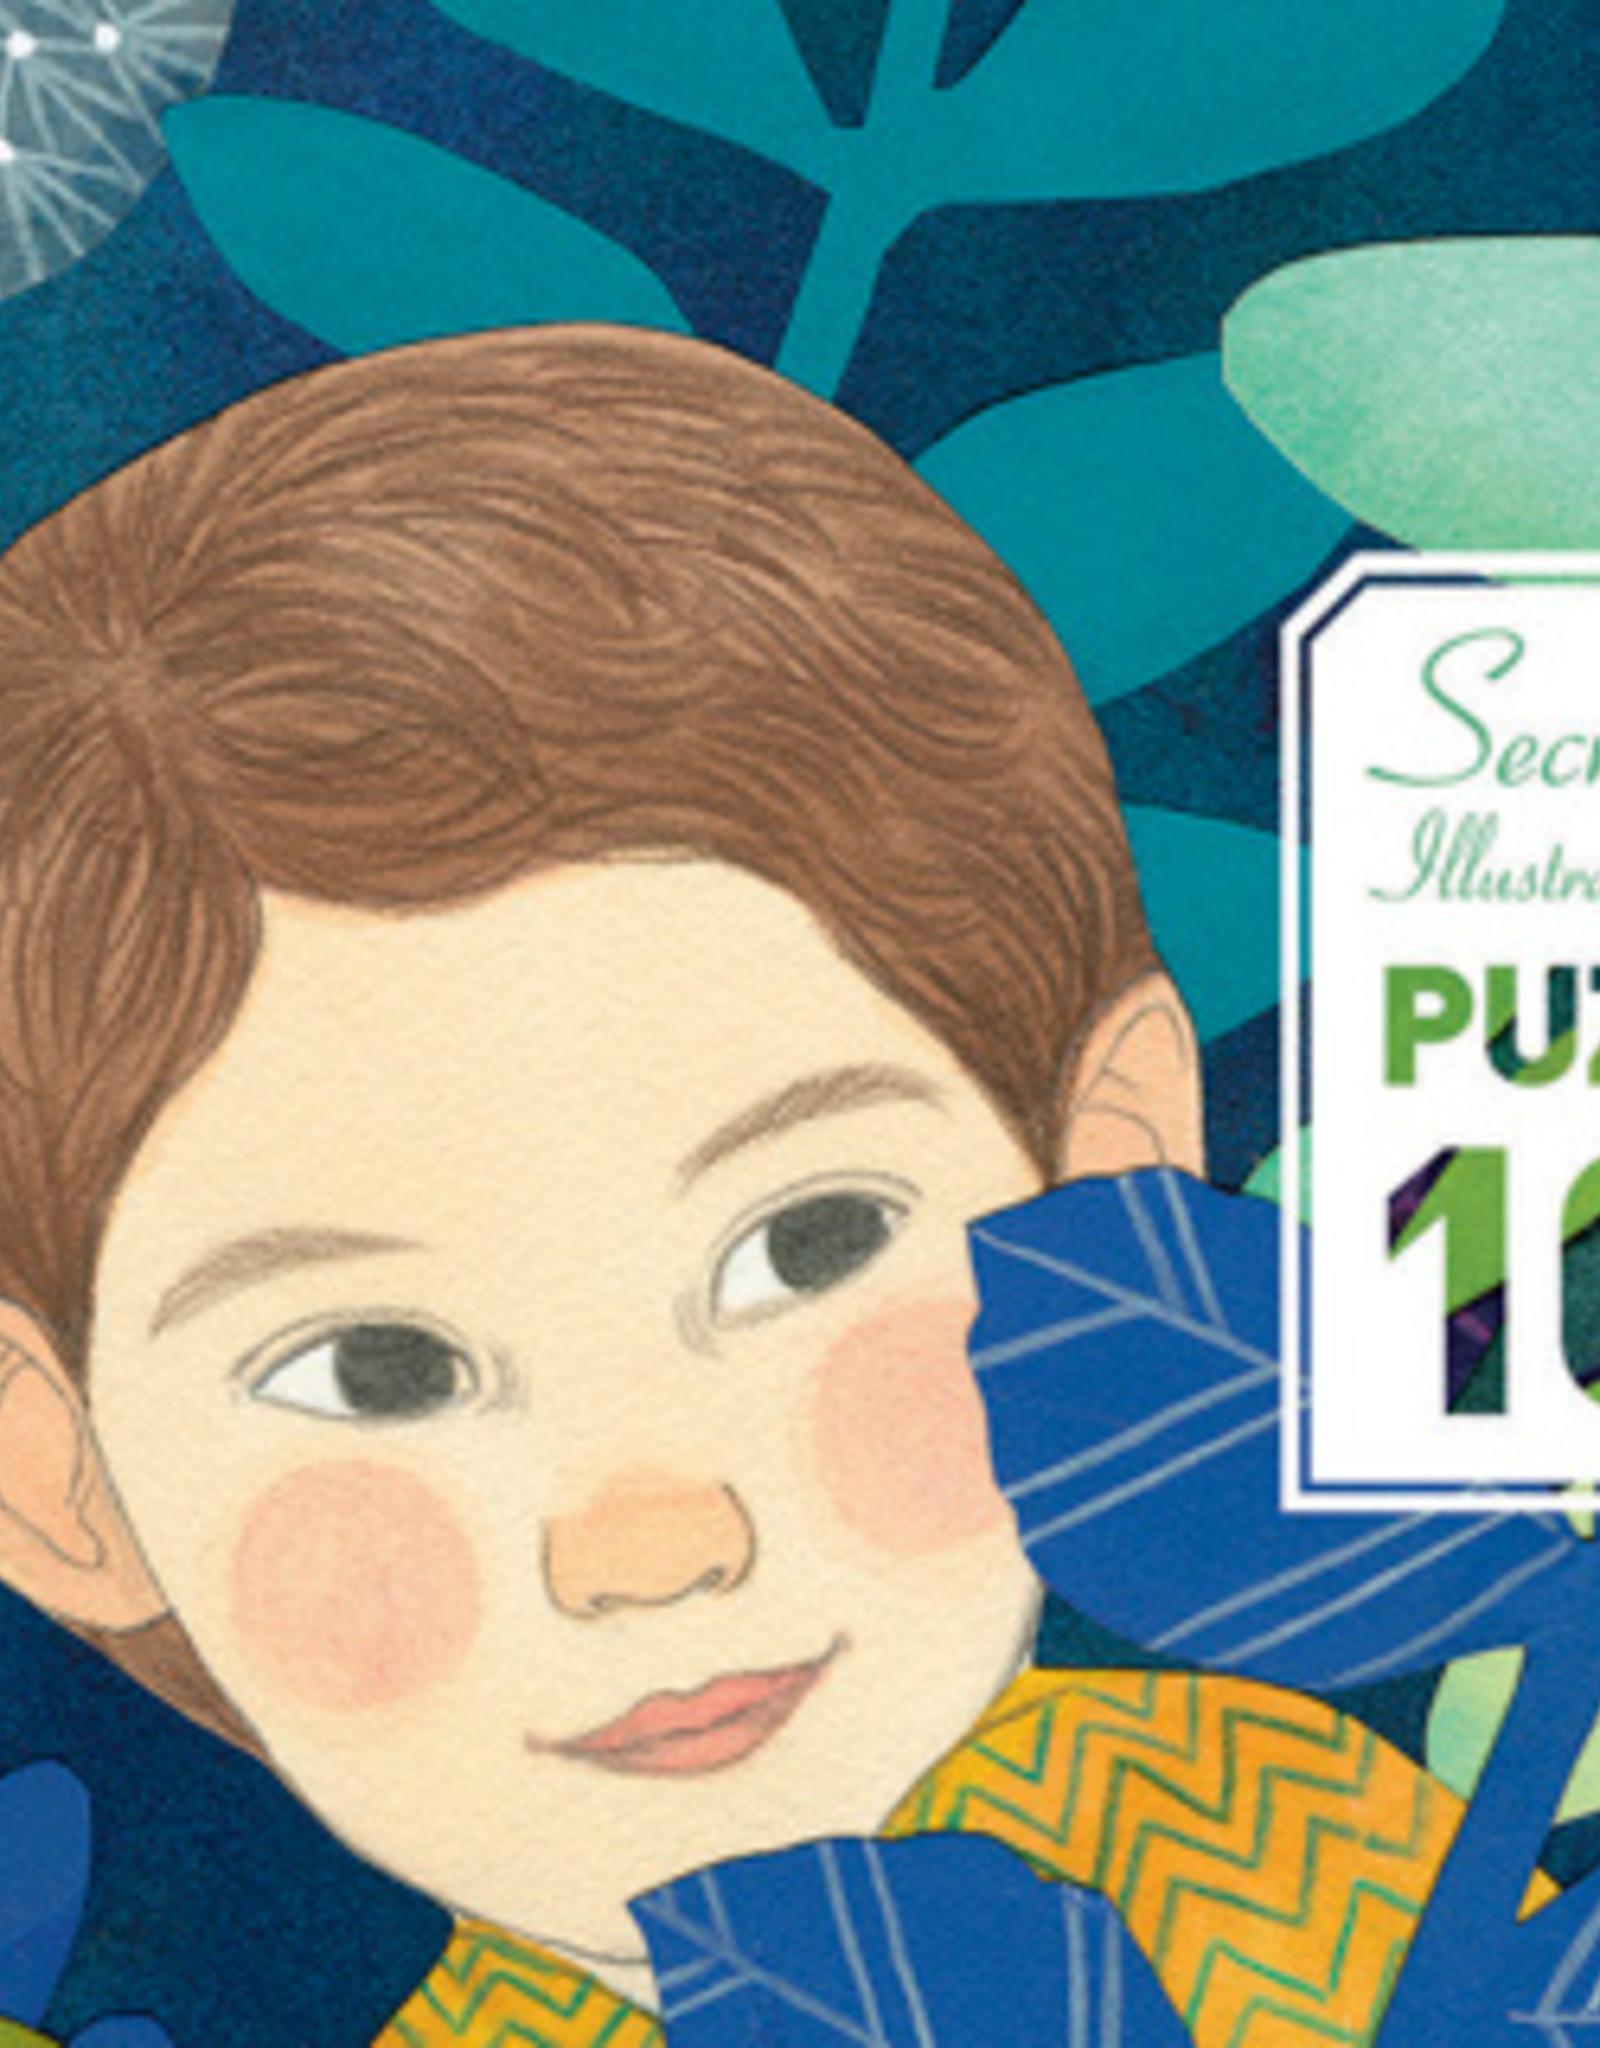 Djeco Djeco - Secrets Puzzle 100 Pce